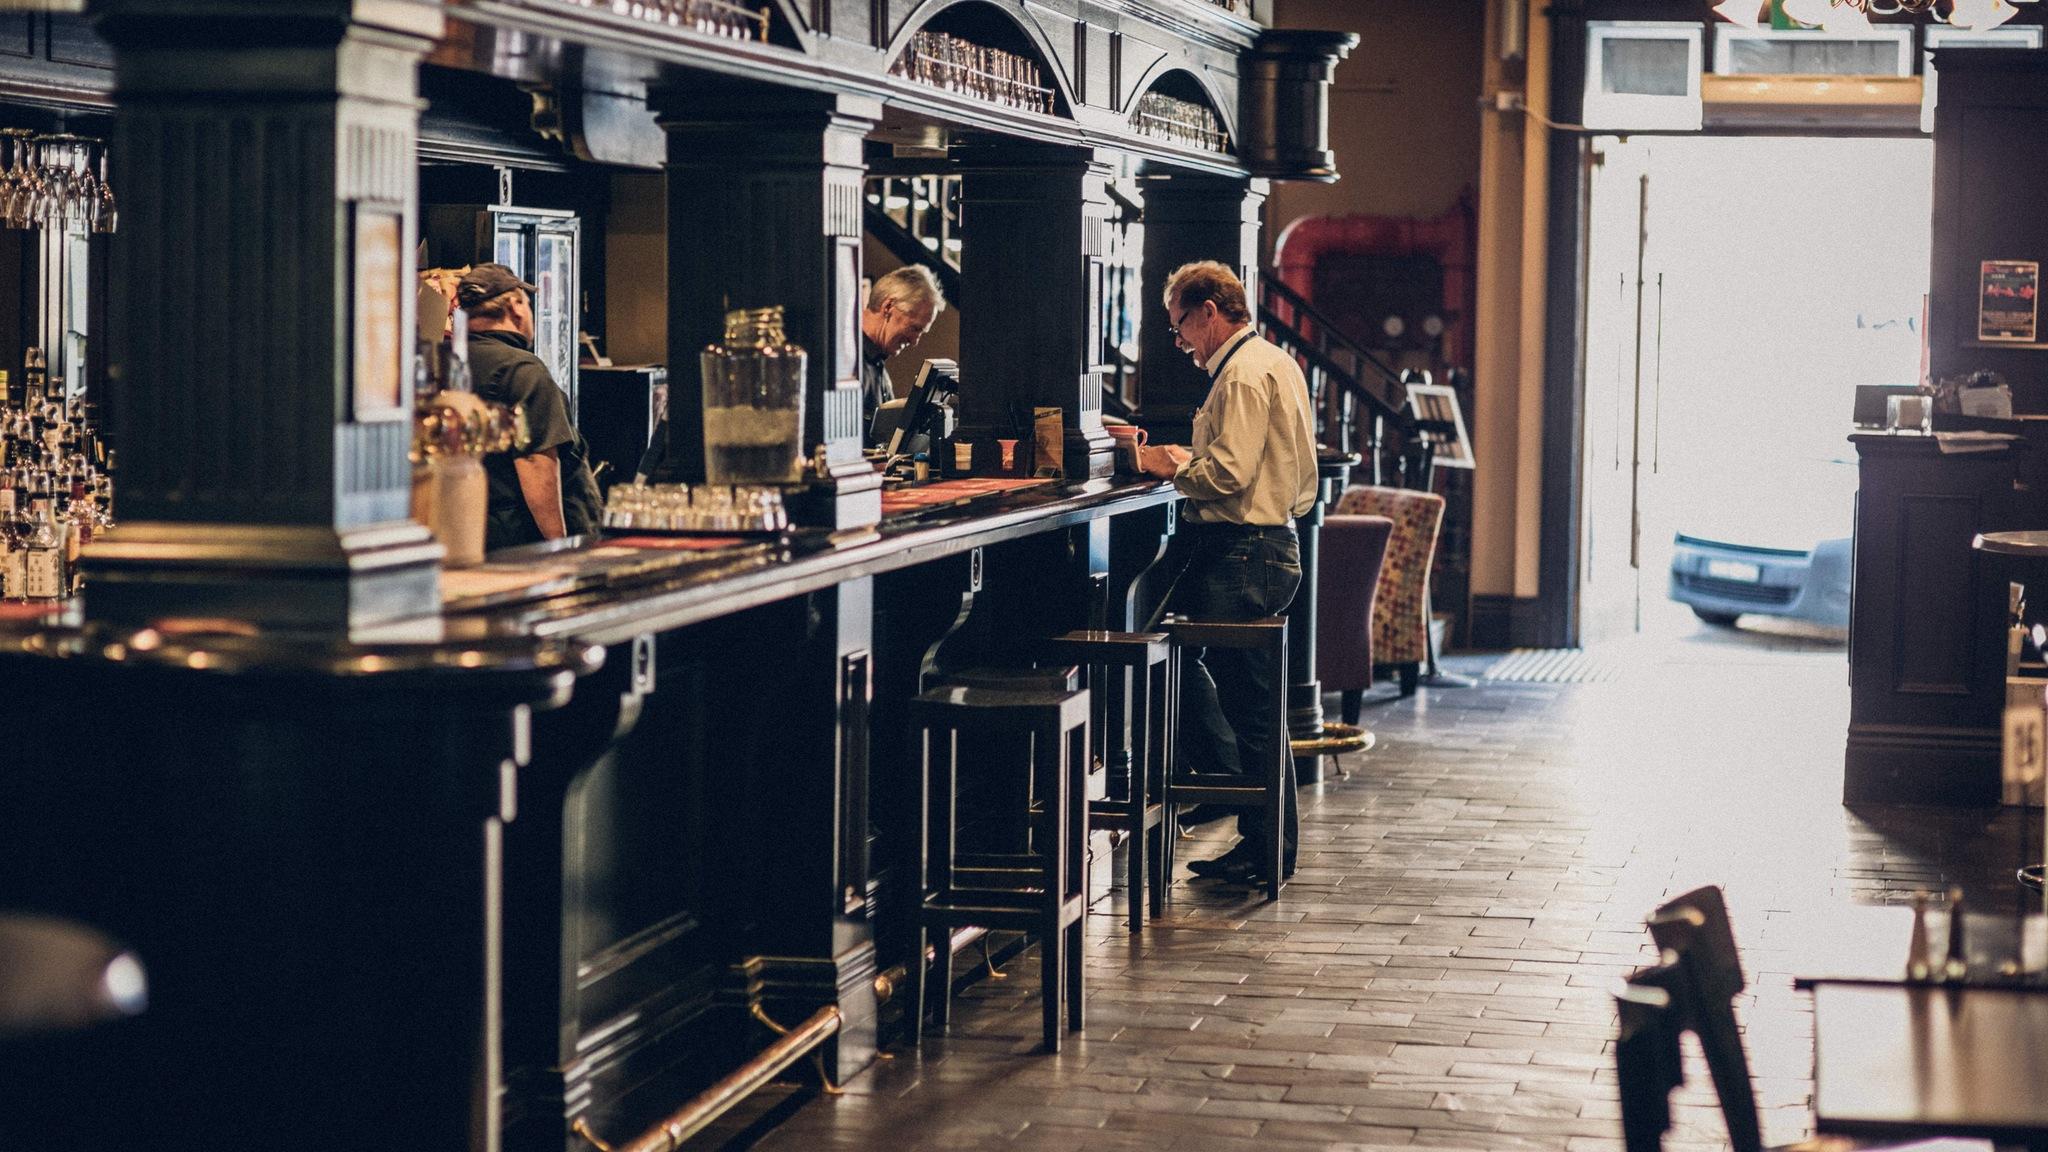 The Miners Tavern